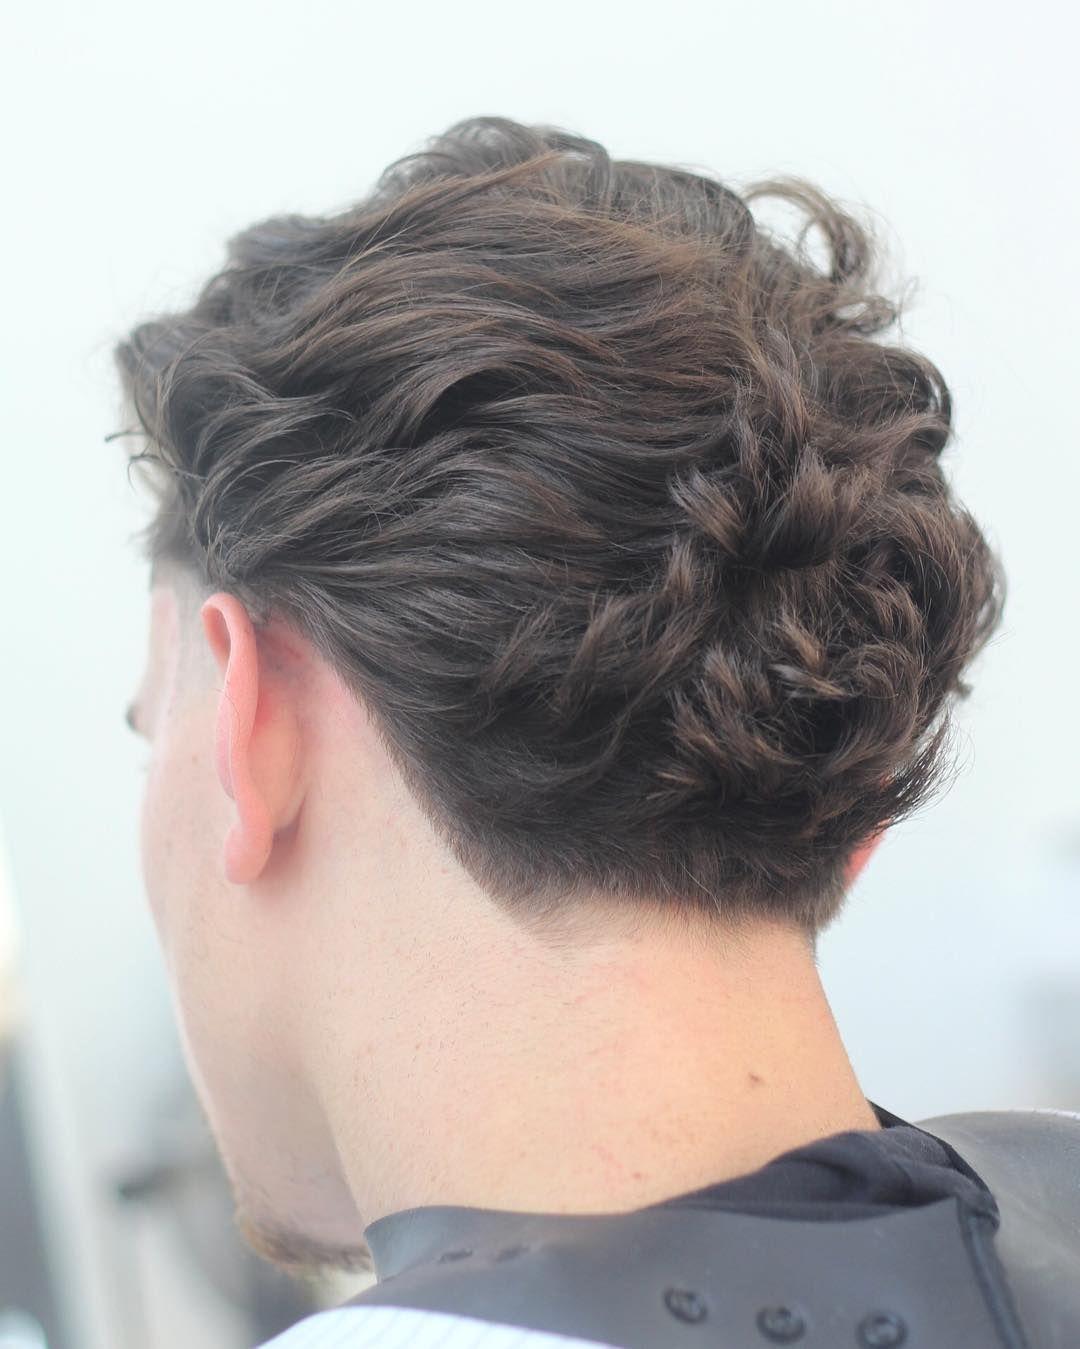 Haircuts for wavy hair men top  menus haircuts  hairstyles for men september  update